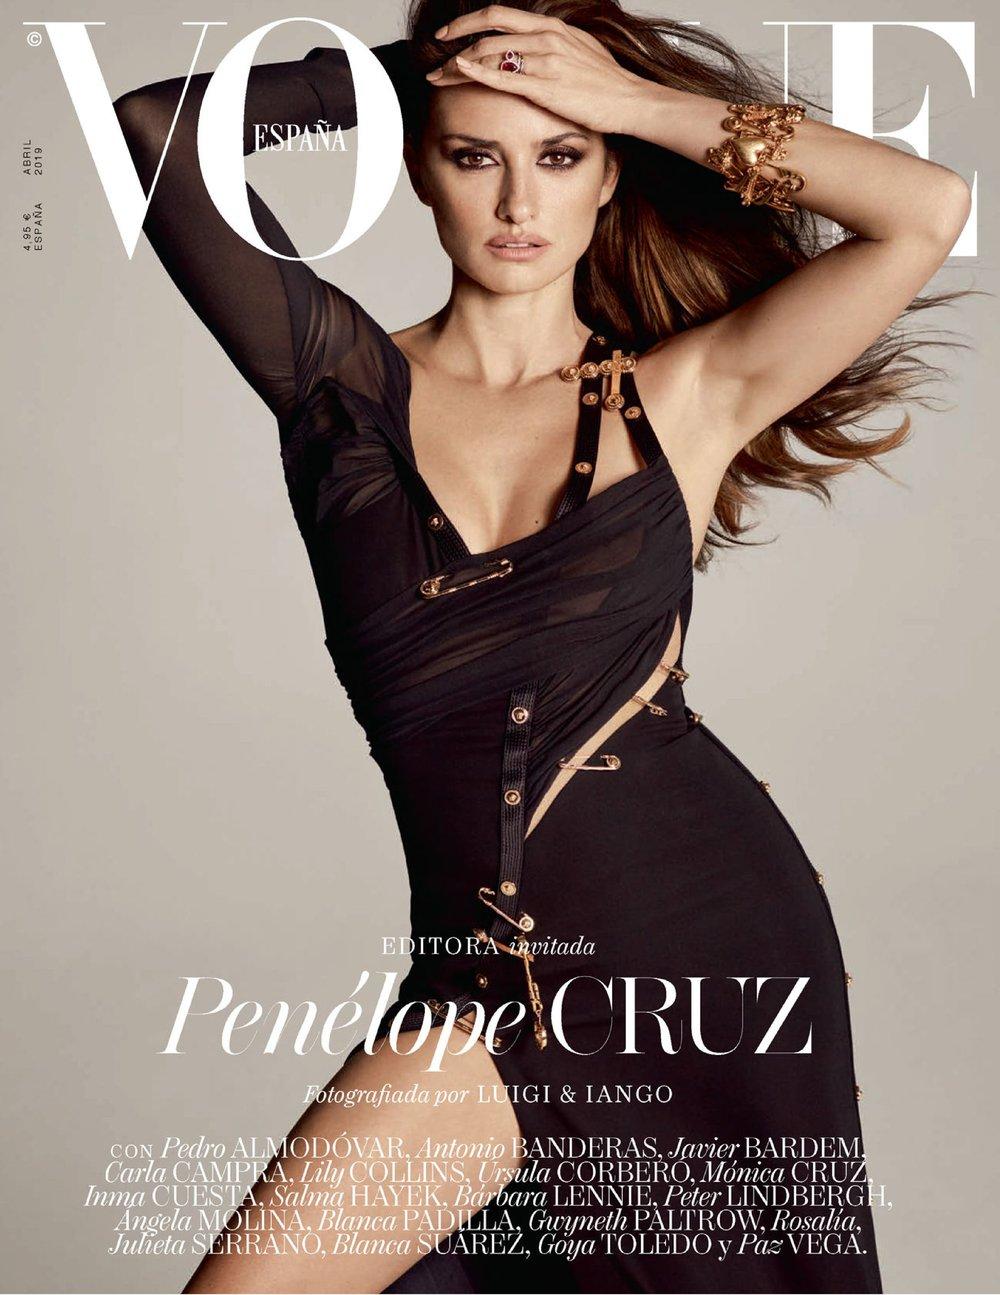 Penelope-Cruz-Luigi-Iango-Vogue-Spain-April-2019- (12).jpg